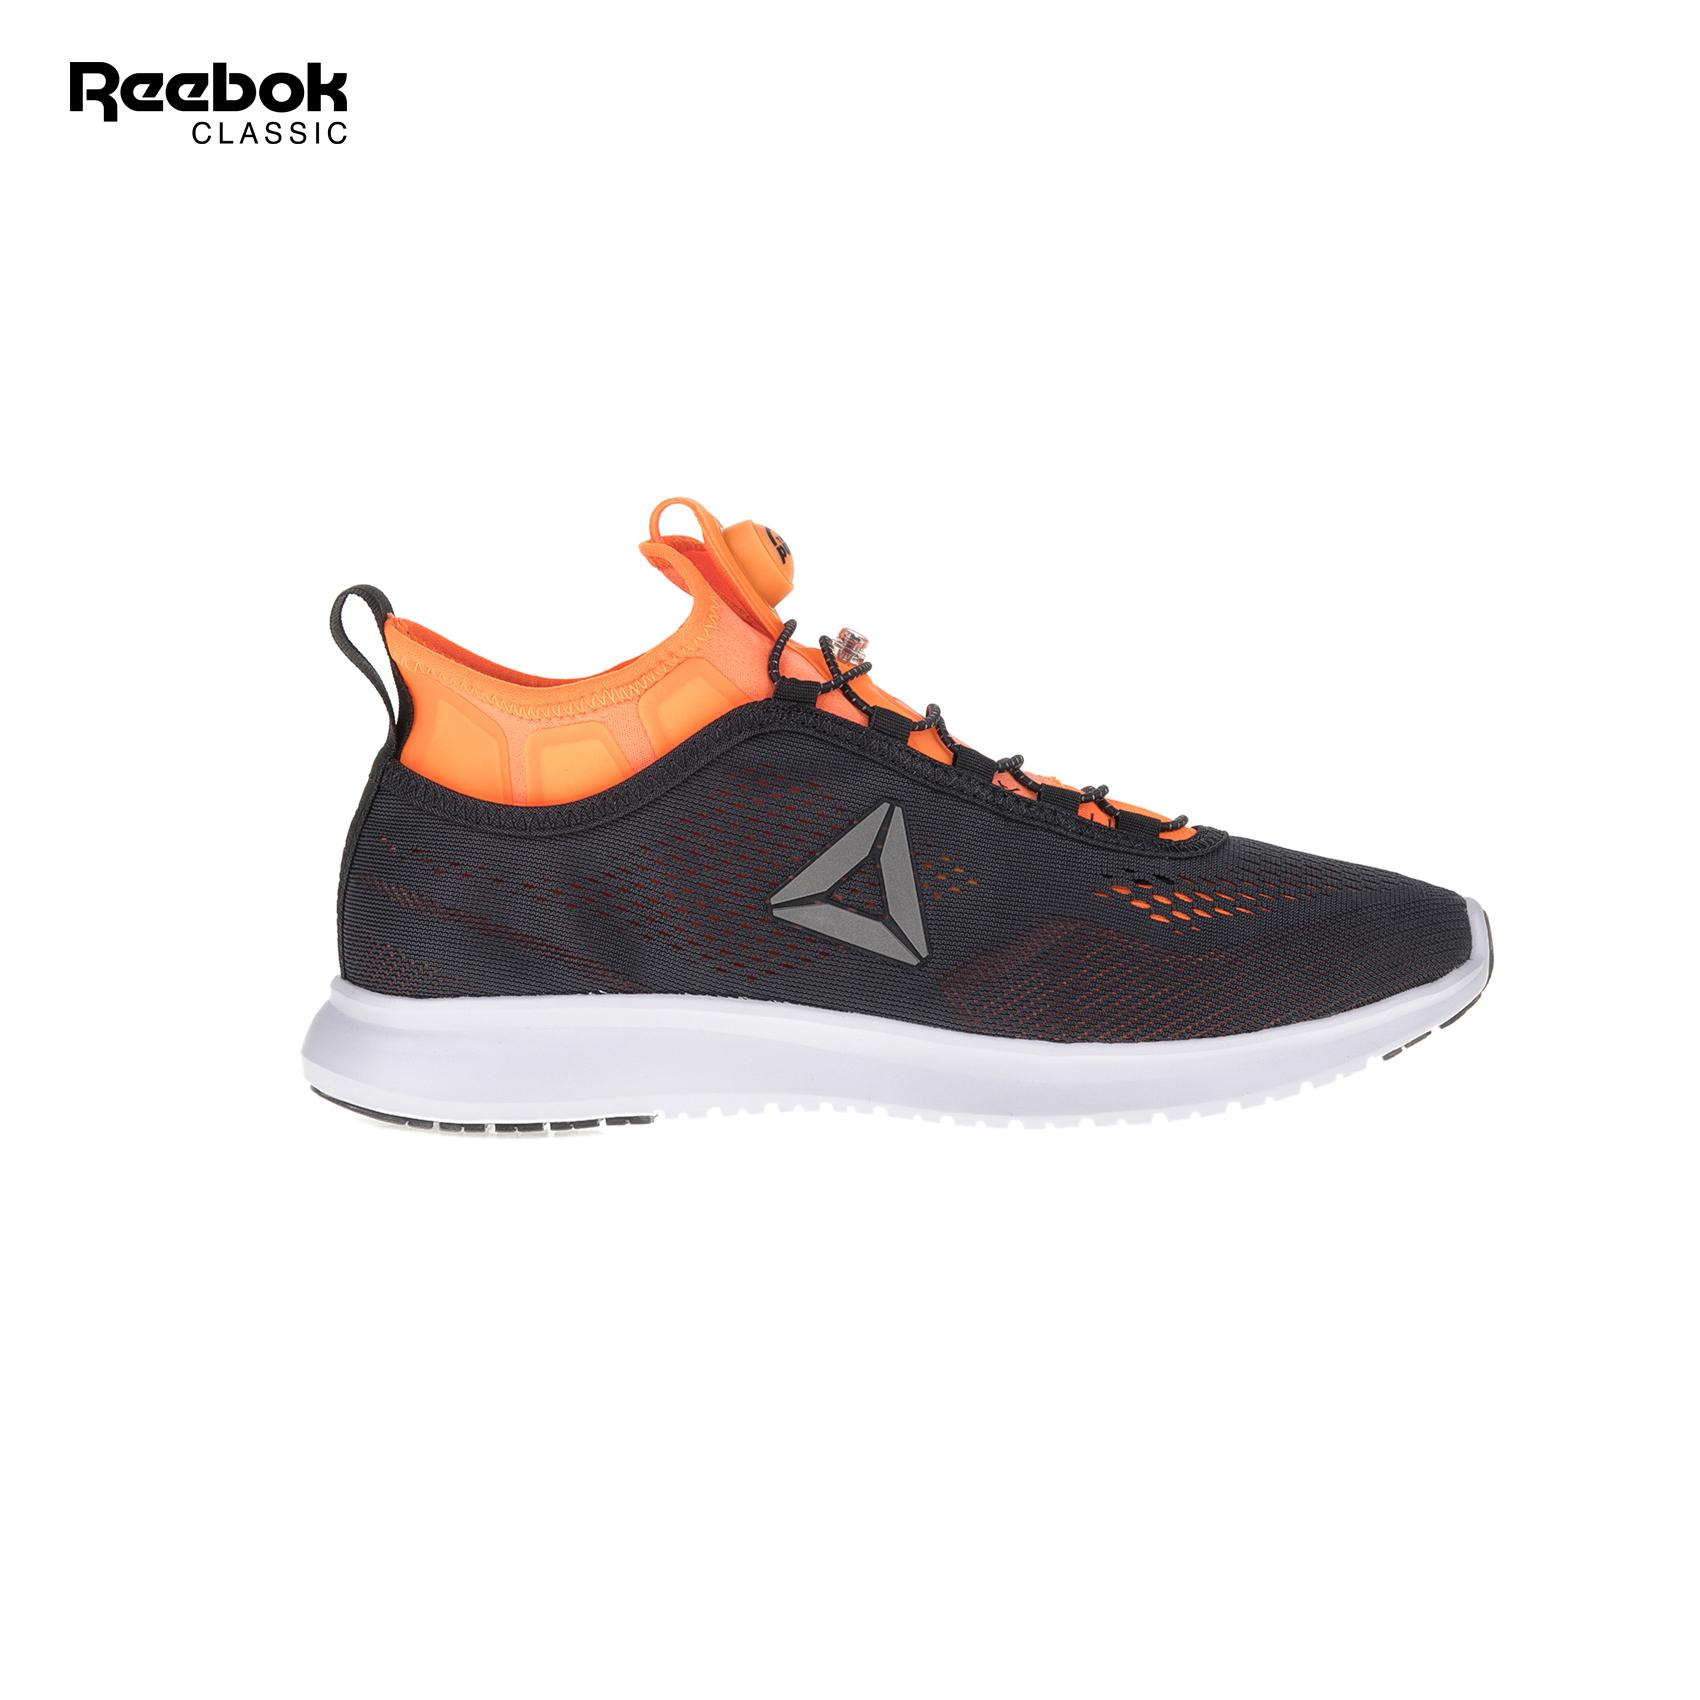 3448603d2df REEBOK CLASSIC - Ανδρικά παπούτσια τρεξίματος REEBOK CLASSICS PUMP PLUS  TECH μαύρα-πορτοκαλί